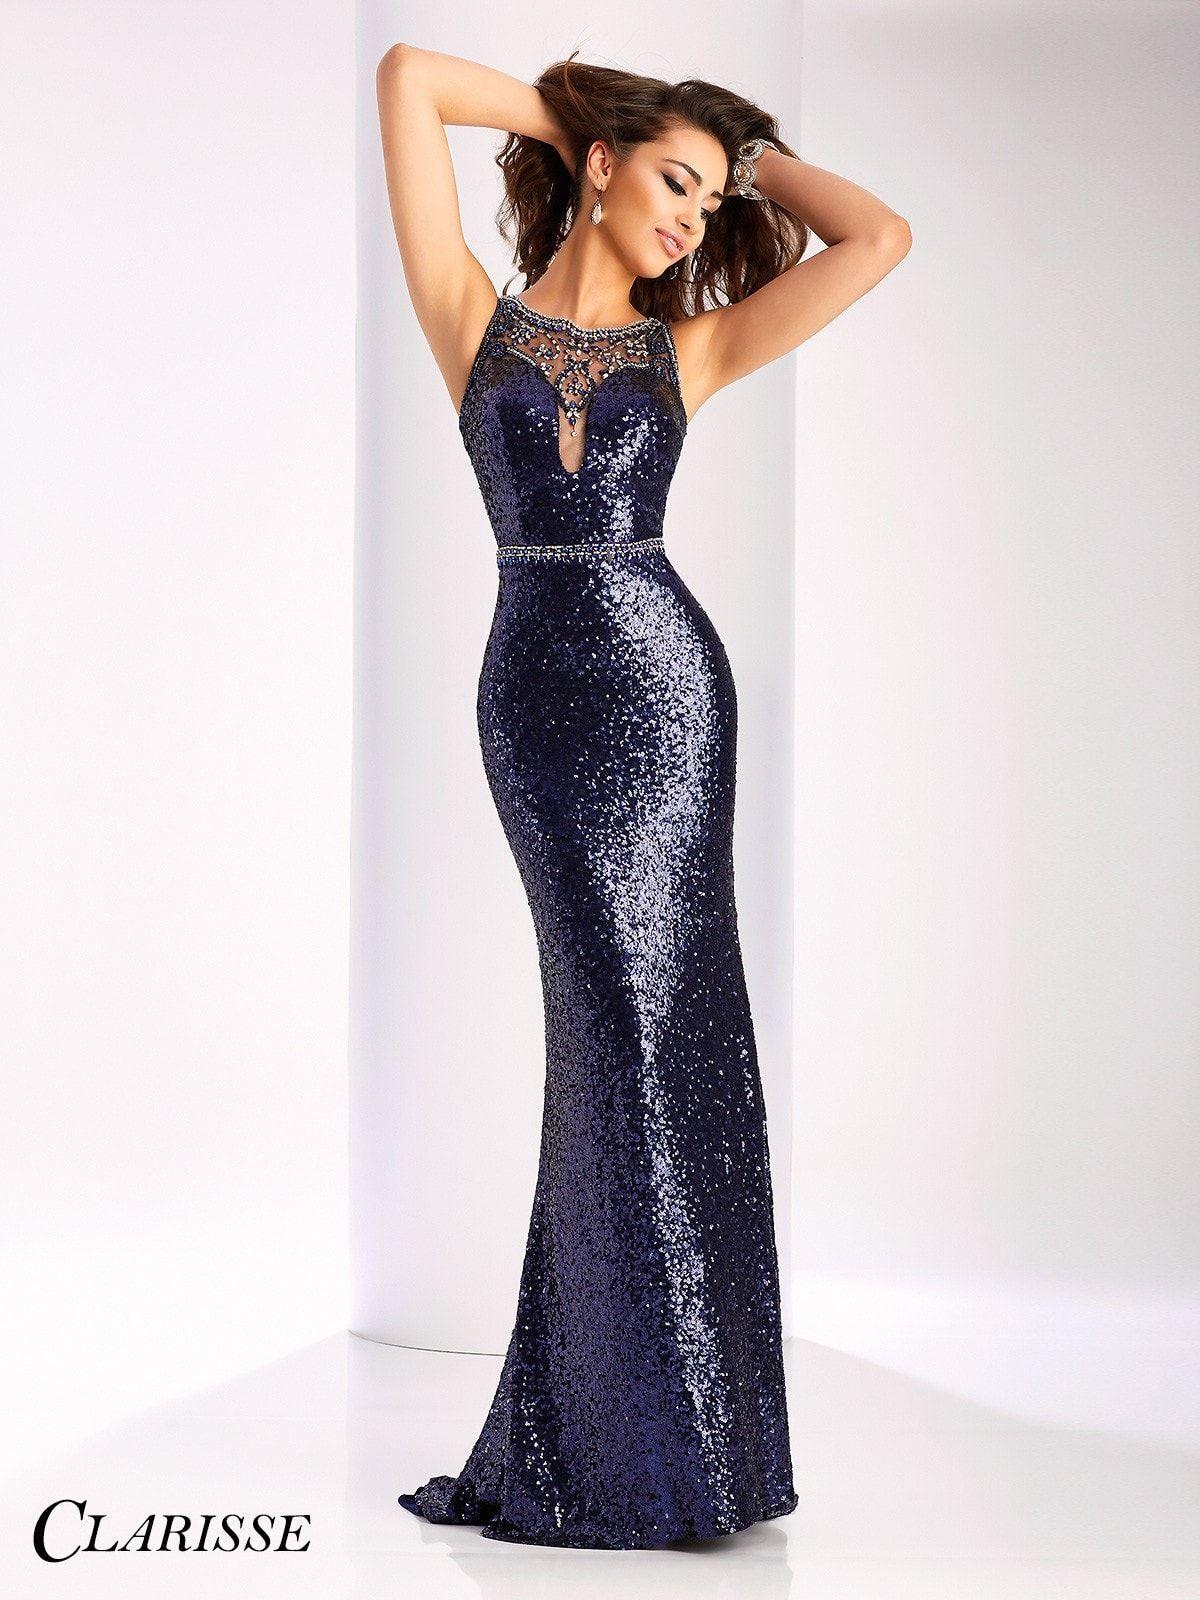 Clarisse prom navy high neckline prom dress navy colour